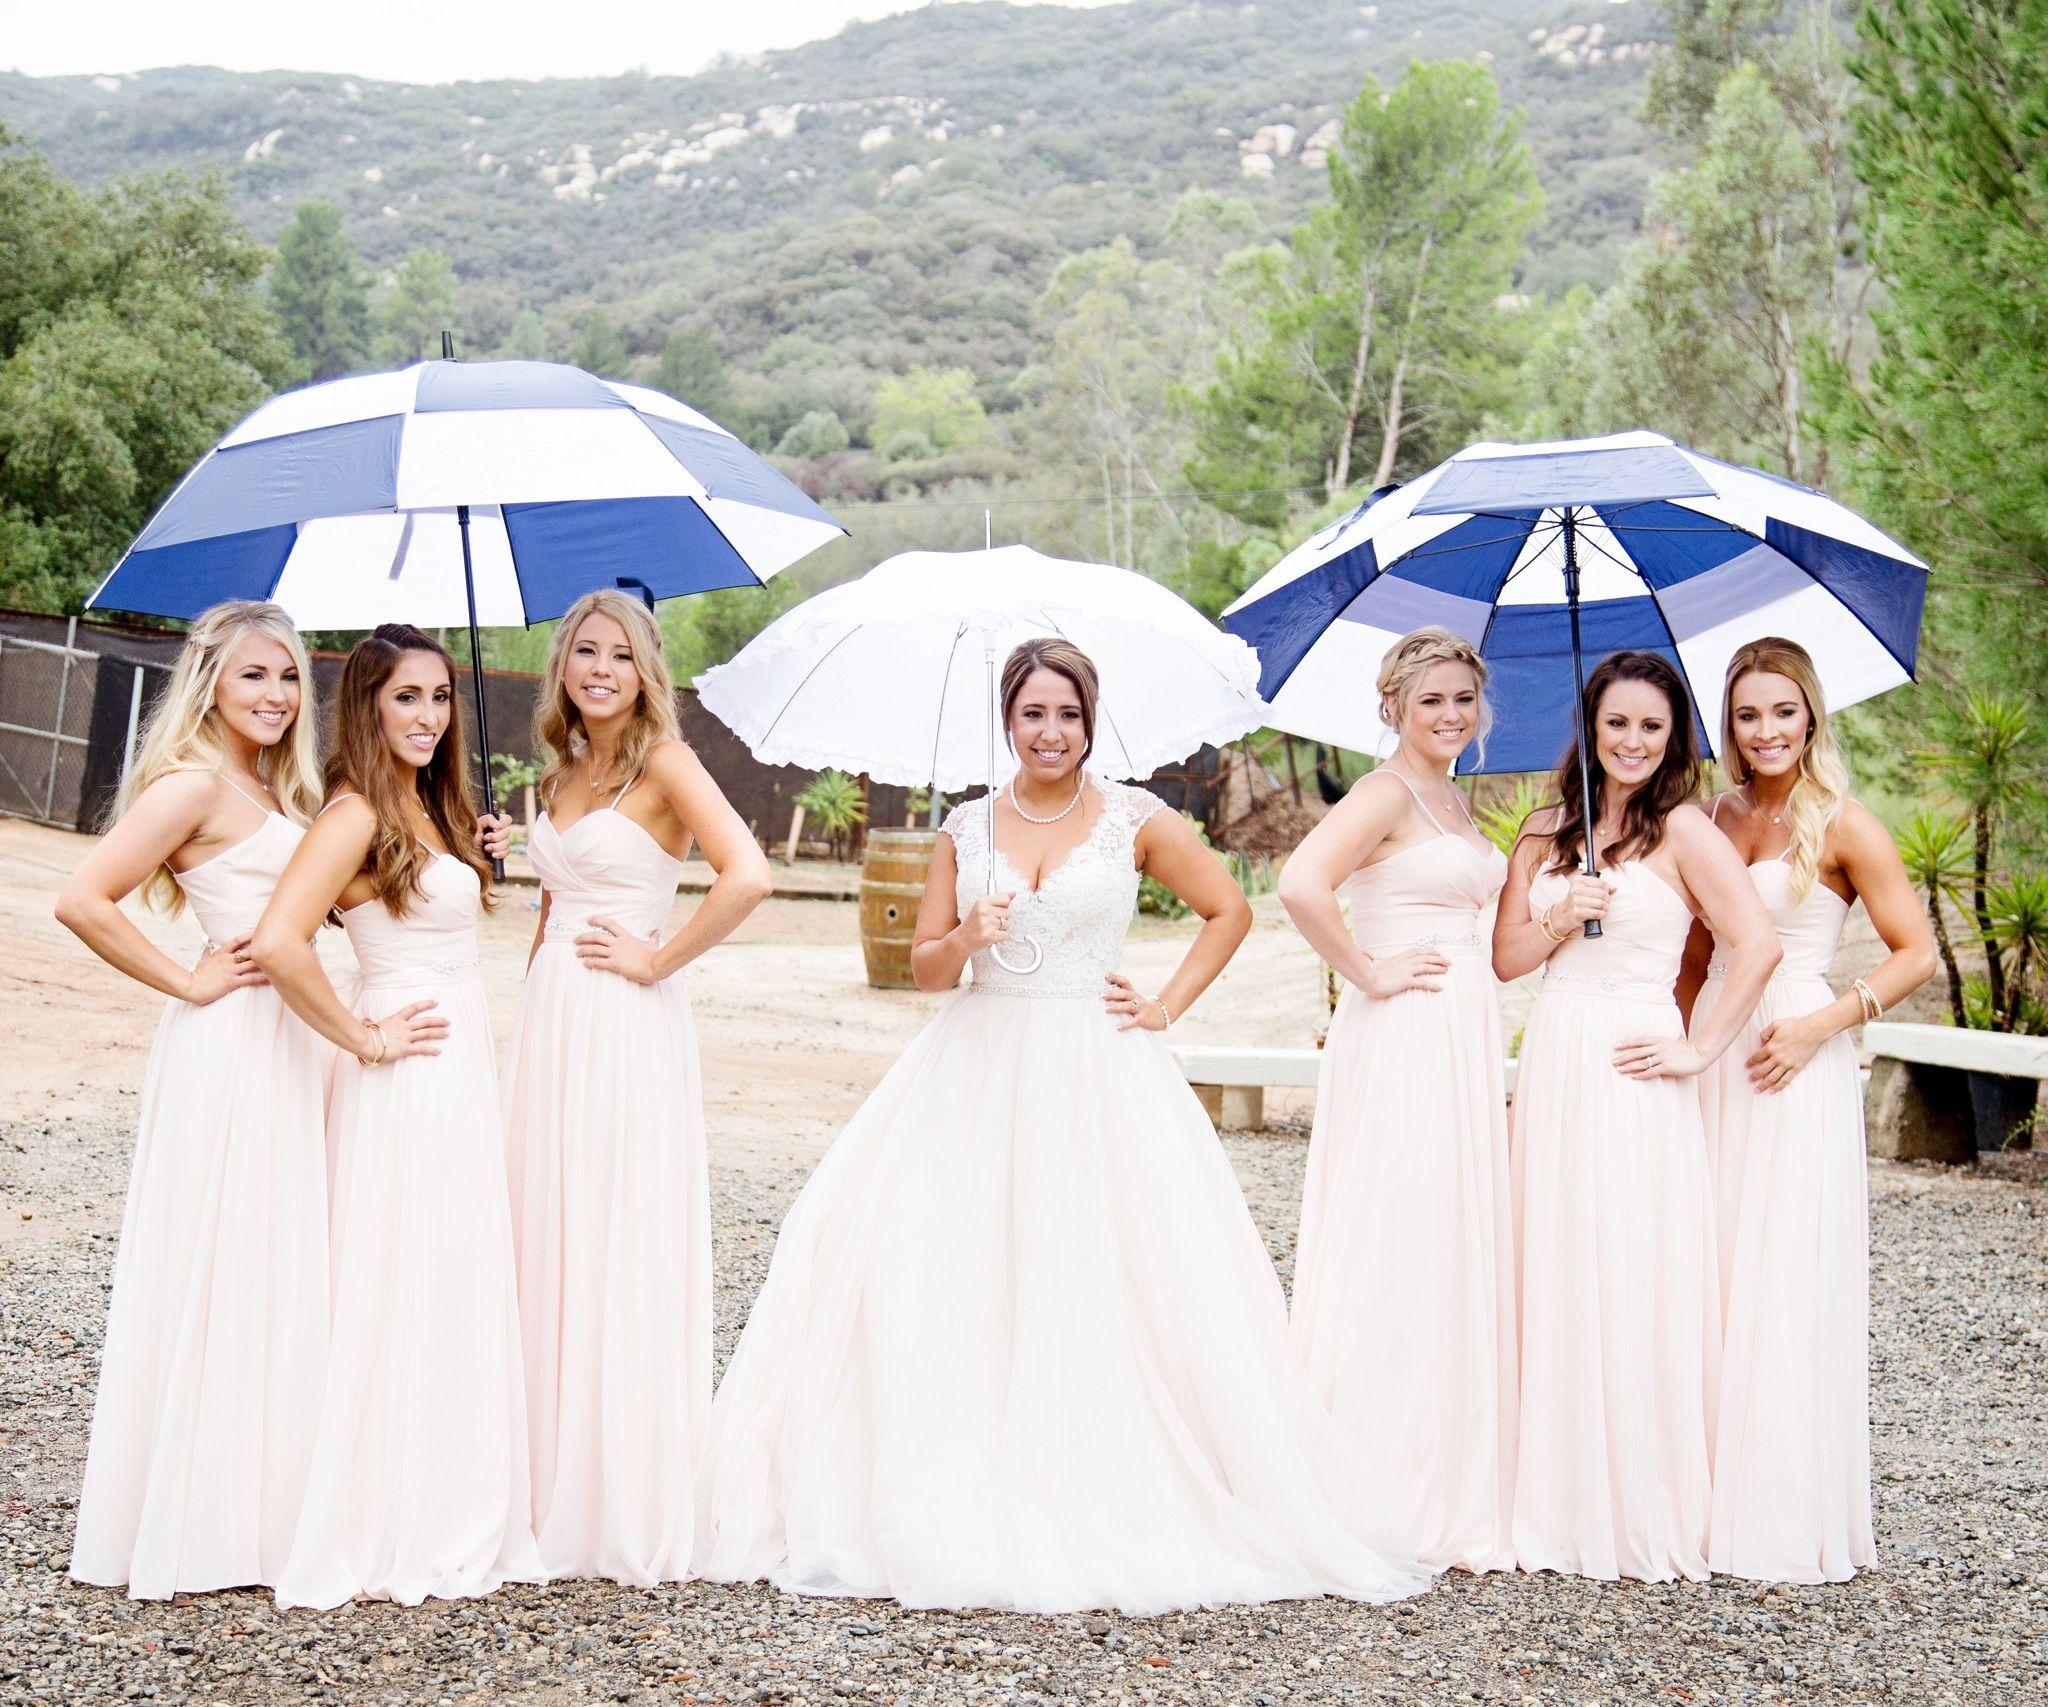 Plus side of a rainy wedding day.